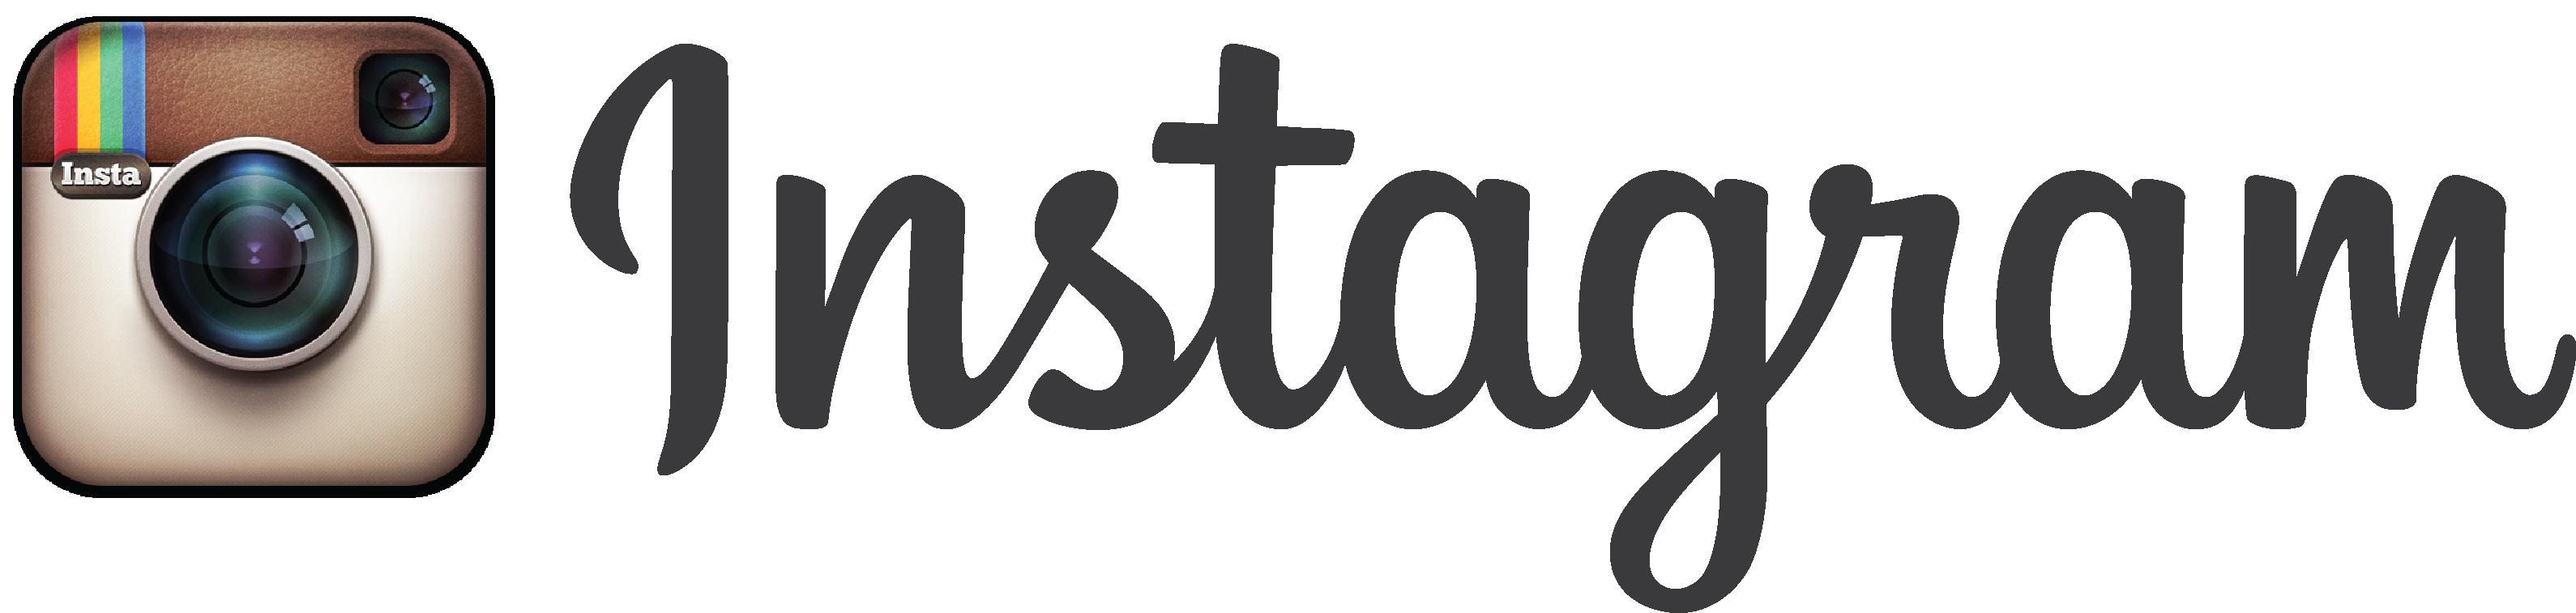 Instagram-Icon-Logo